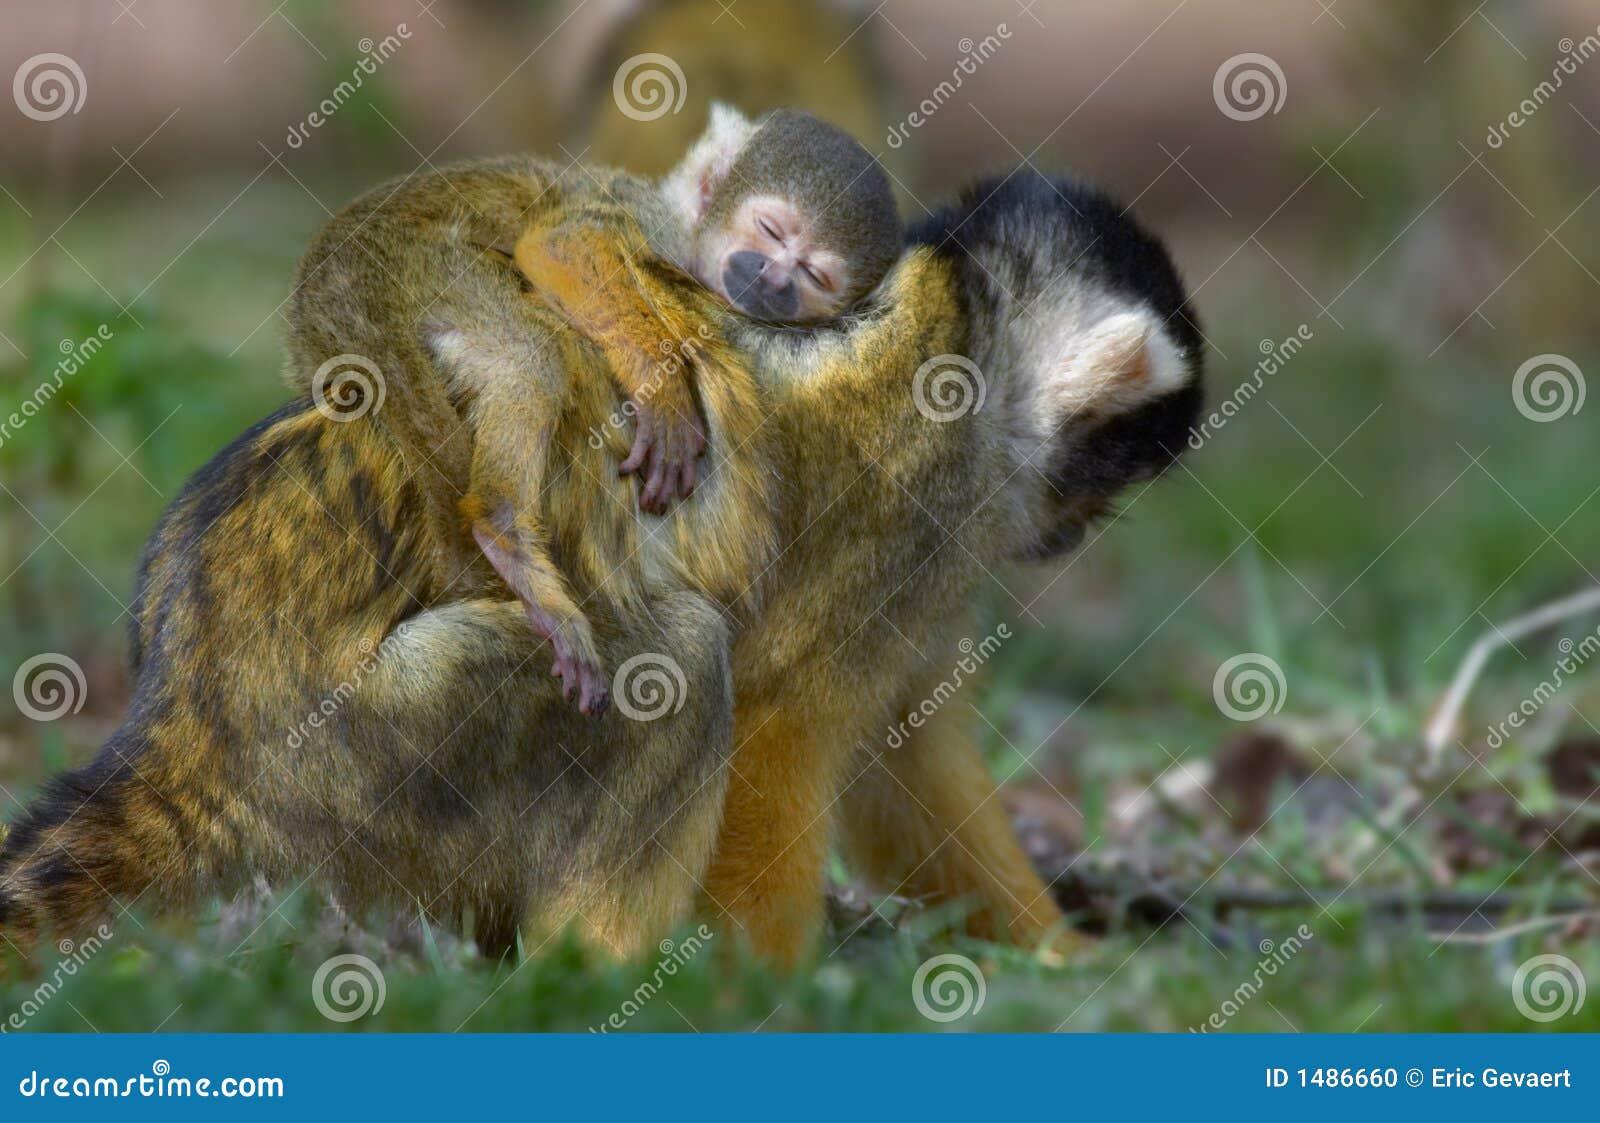 Baby Squirrel Monkey Asleep On Mothers Back Stock Photo Image